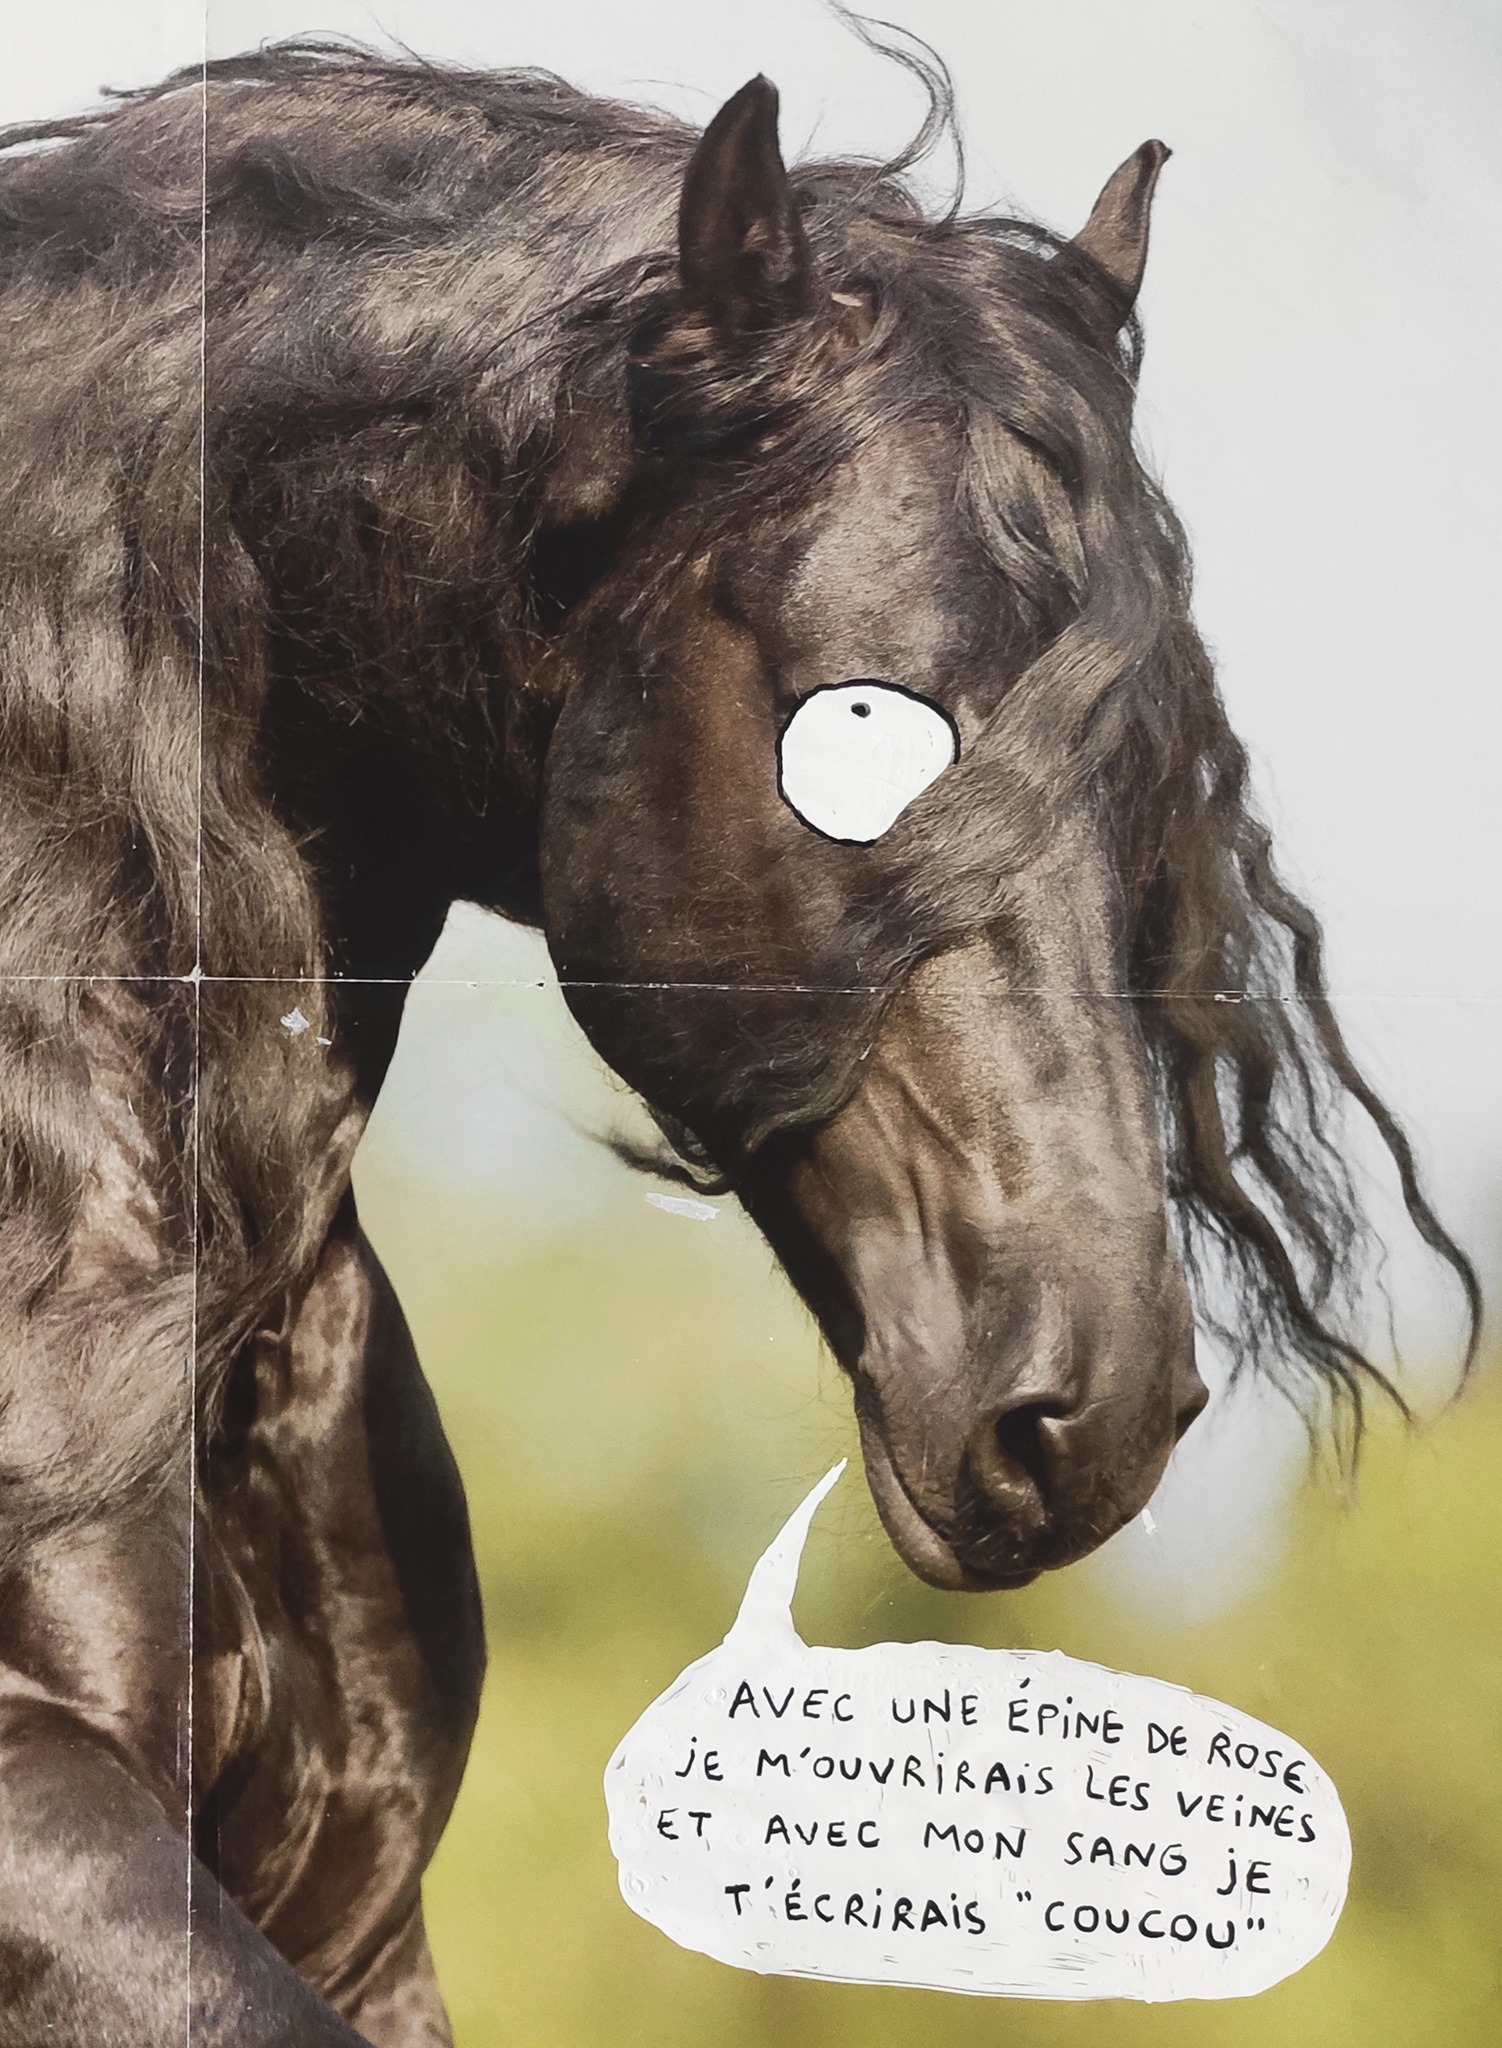 cheval-nils-bertho-artiste-underground-dessin-tableau-oeuvre-rottring-art-créature-monstre-imaginaire-figuratif-minutieux-original